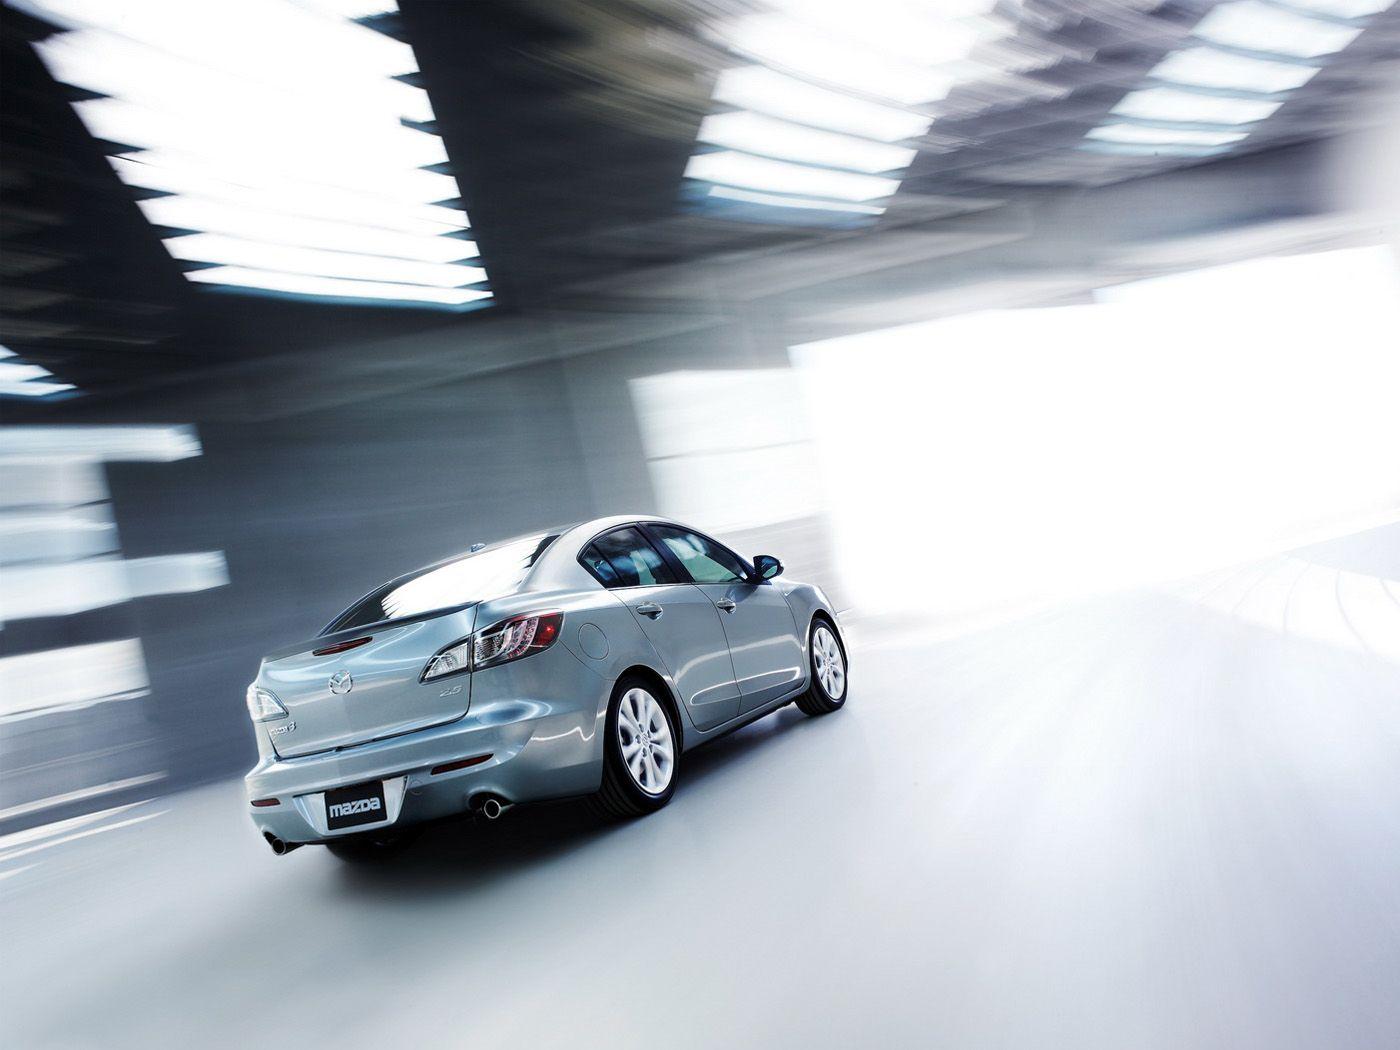 Mazda 3 2010 Sedan Rear View Wallpaper 1400x1050